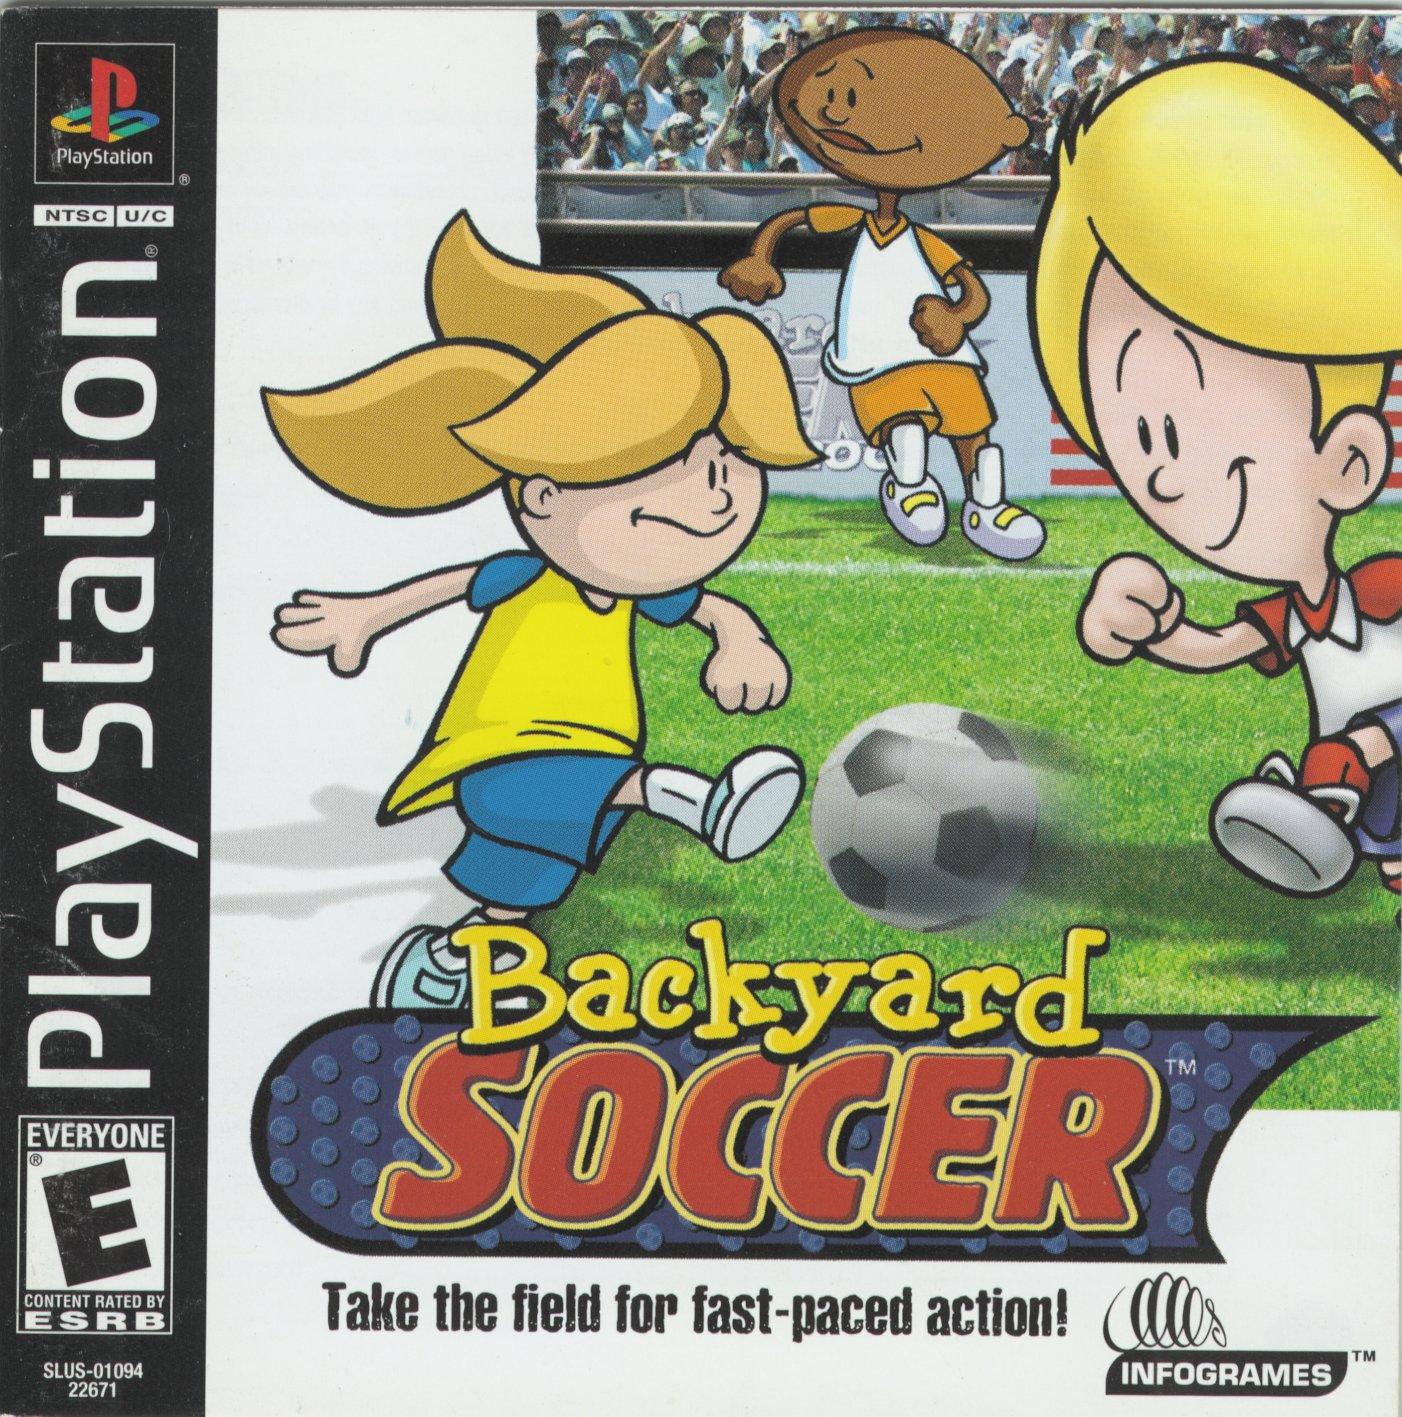 Backyard Soccer Download : Backyard Soccer [U] ISO Download